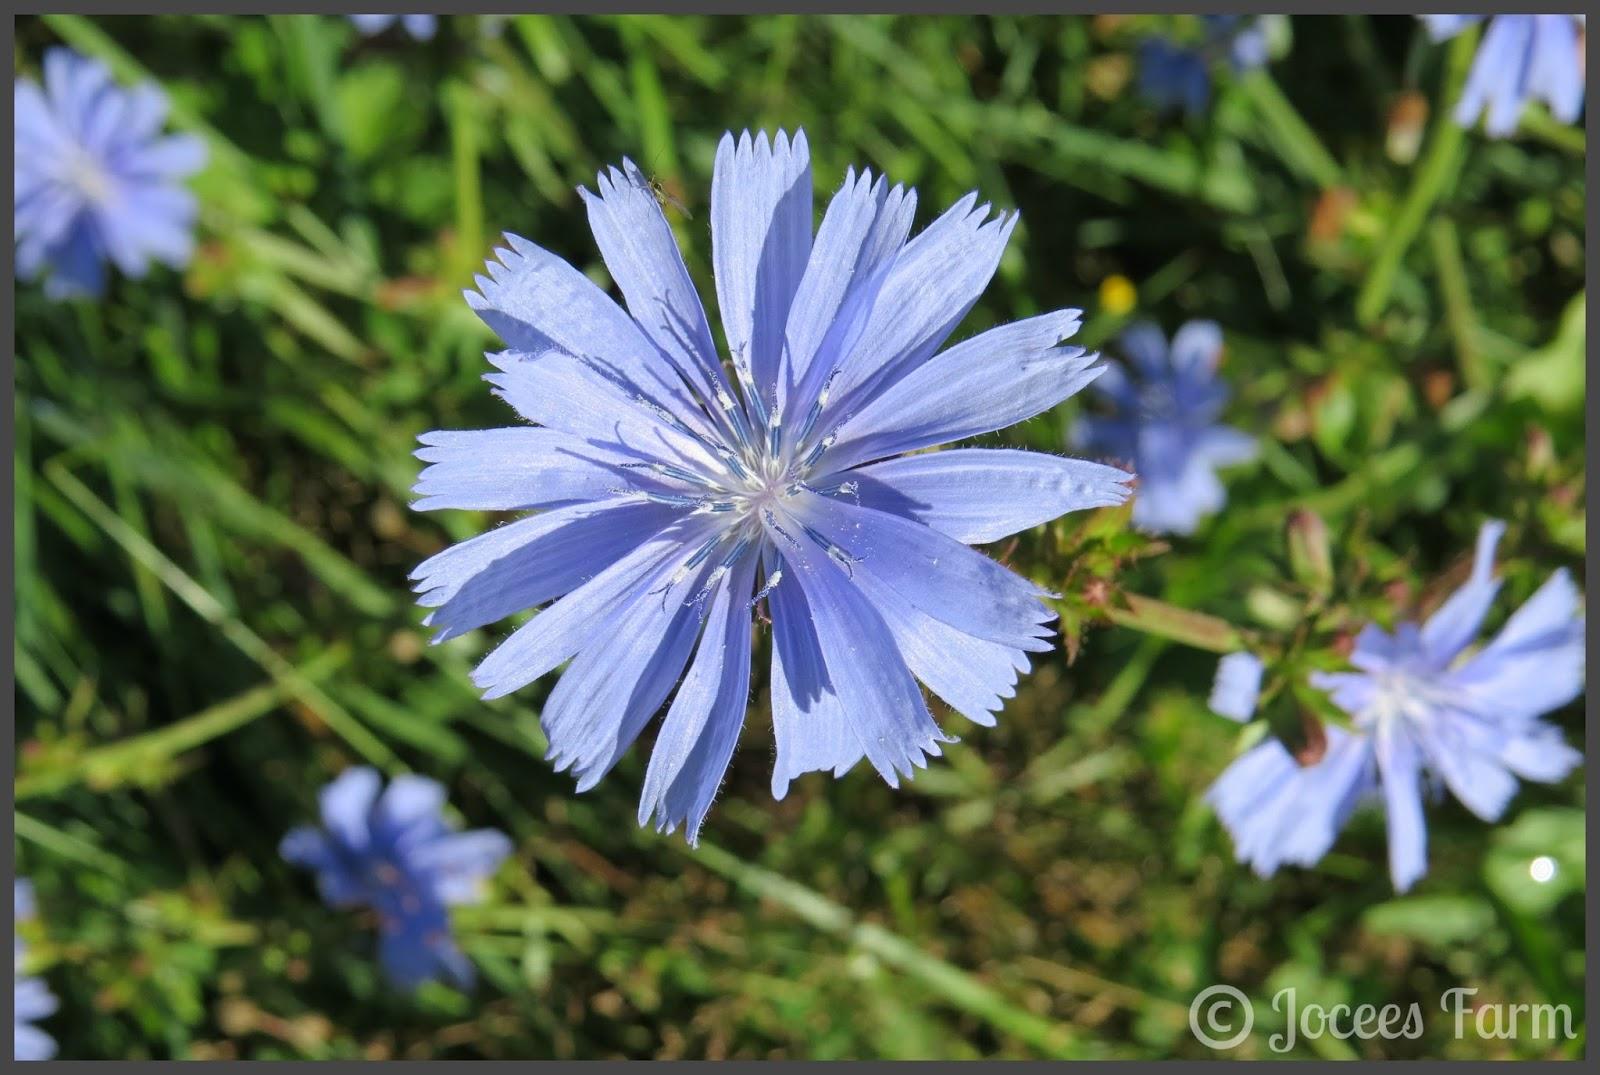 Chicory @ joceesfarm.blogspot.com